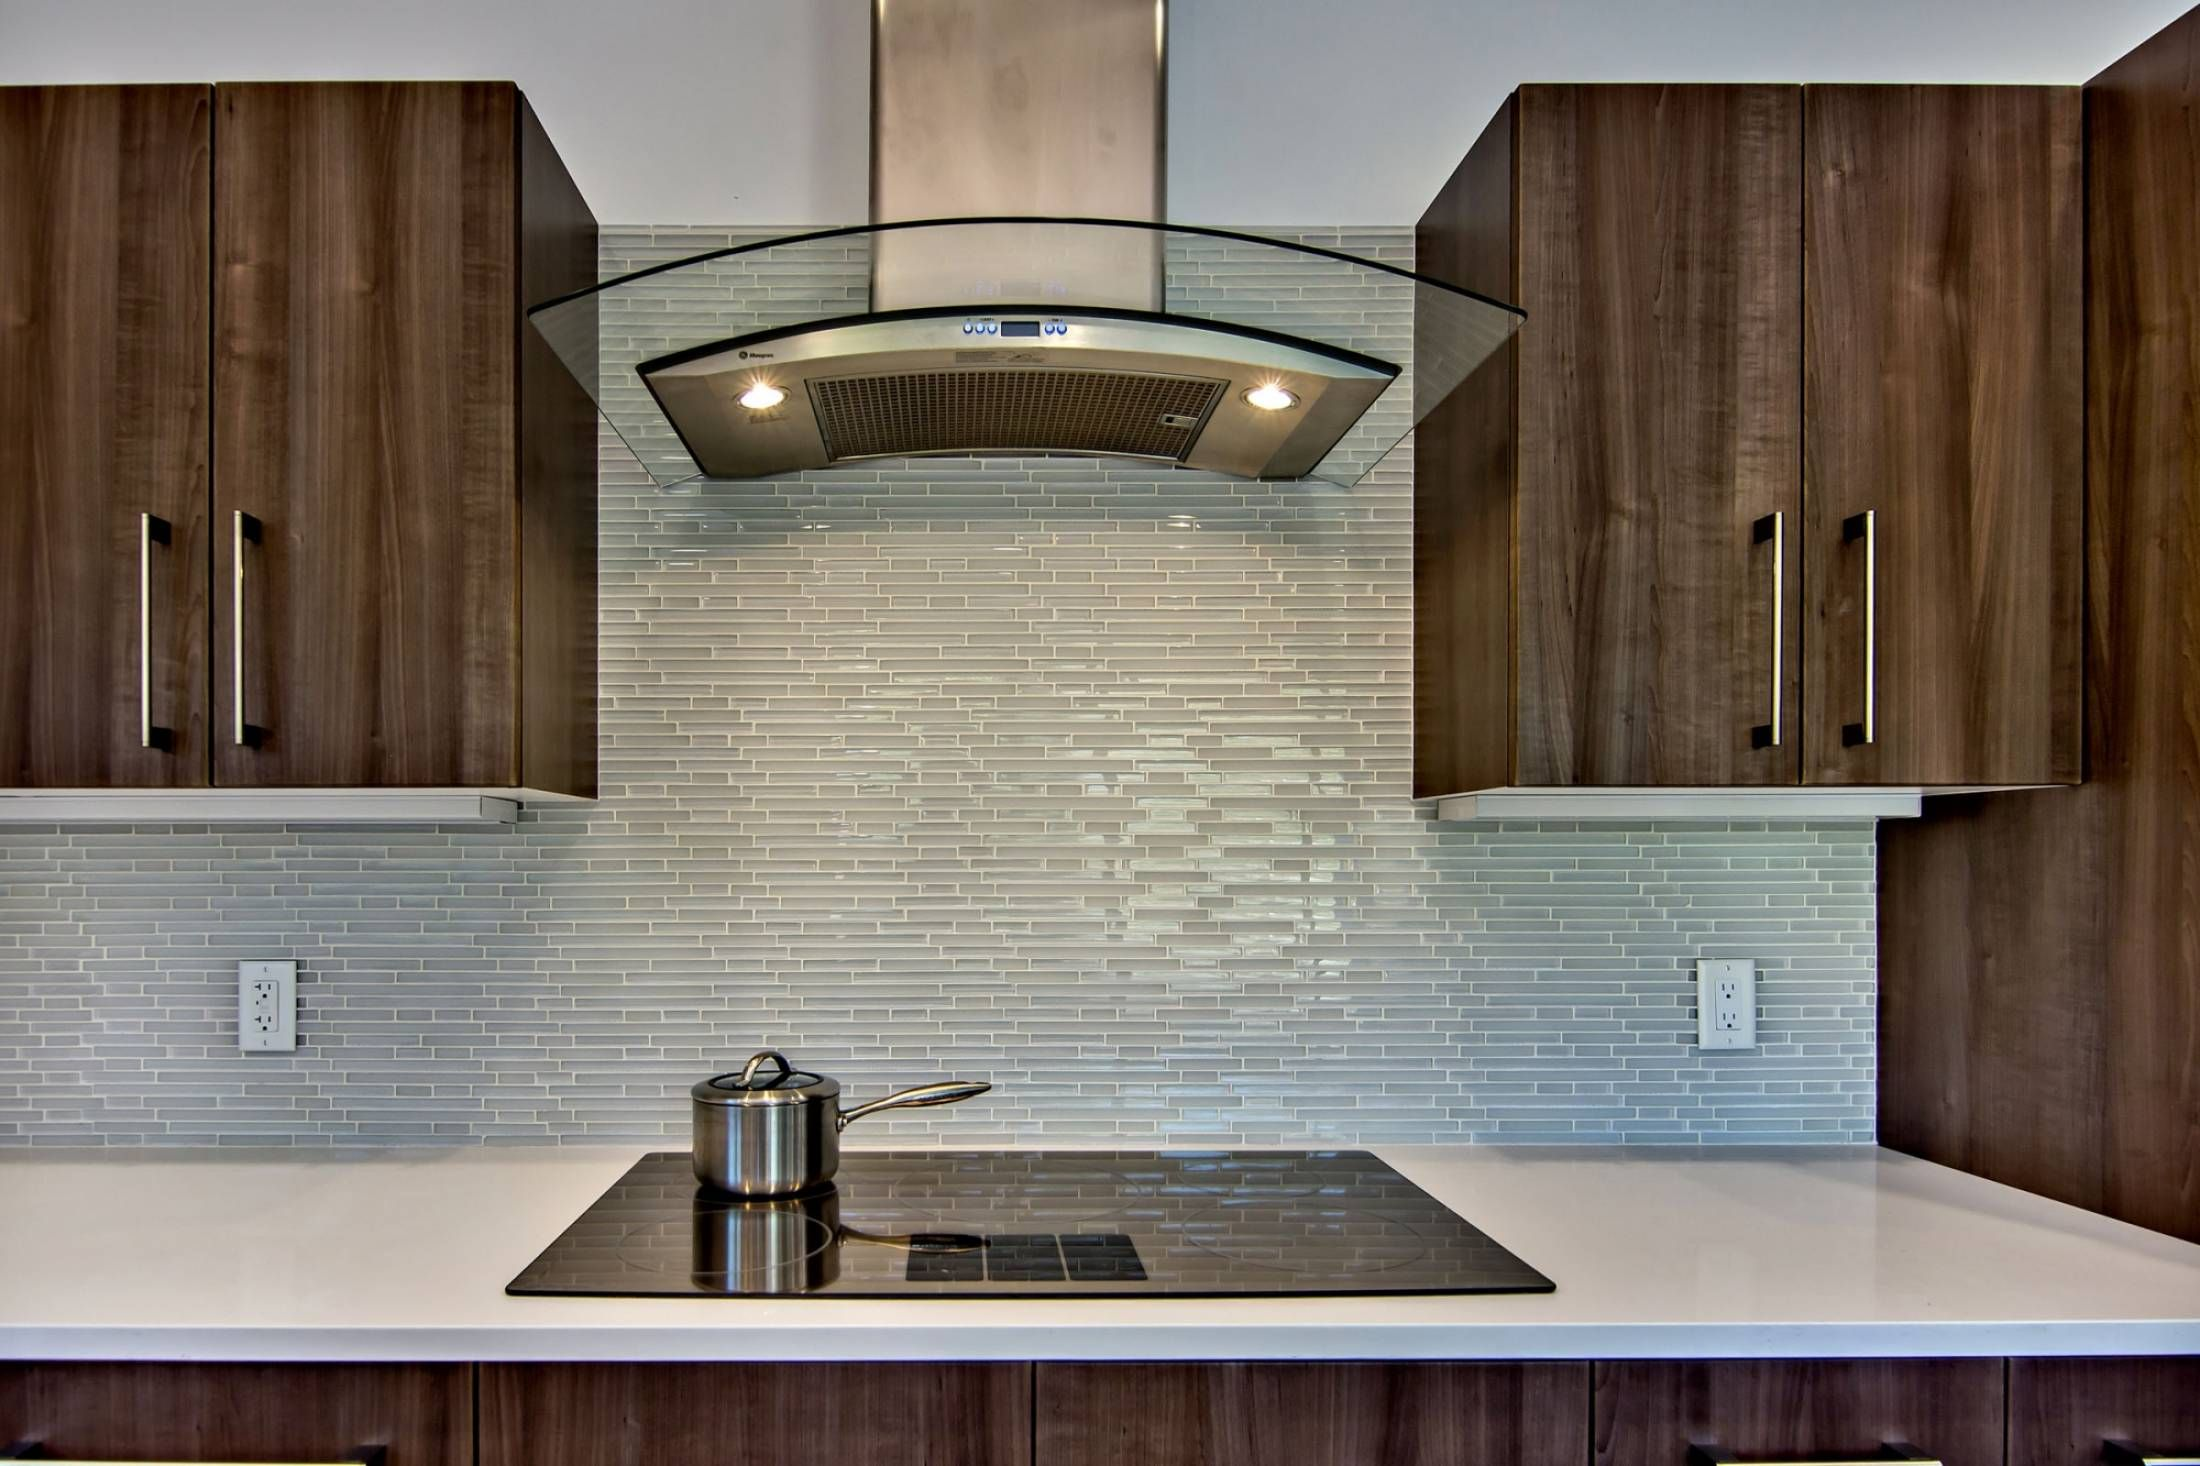 Decoration, Modern Kitchen Design With Fancy Inexpensive Mosaic Glass Tile Backsplash Behind Modern Kitchen Appliances And Rosewood Kitchen Cabinet White Quartz Countertop Design Ideas ~ Many Ways to Find Lovely Inexpensive Backsplash Options for your Kitchen